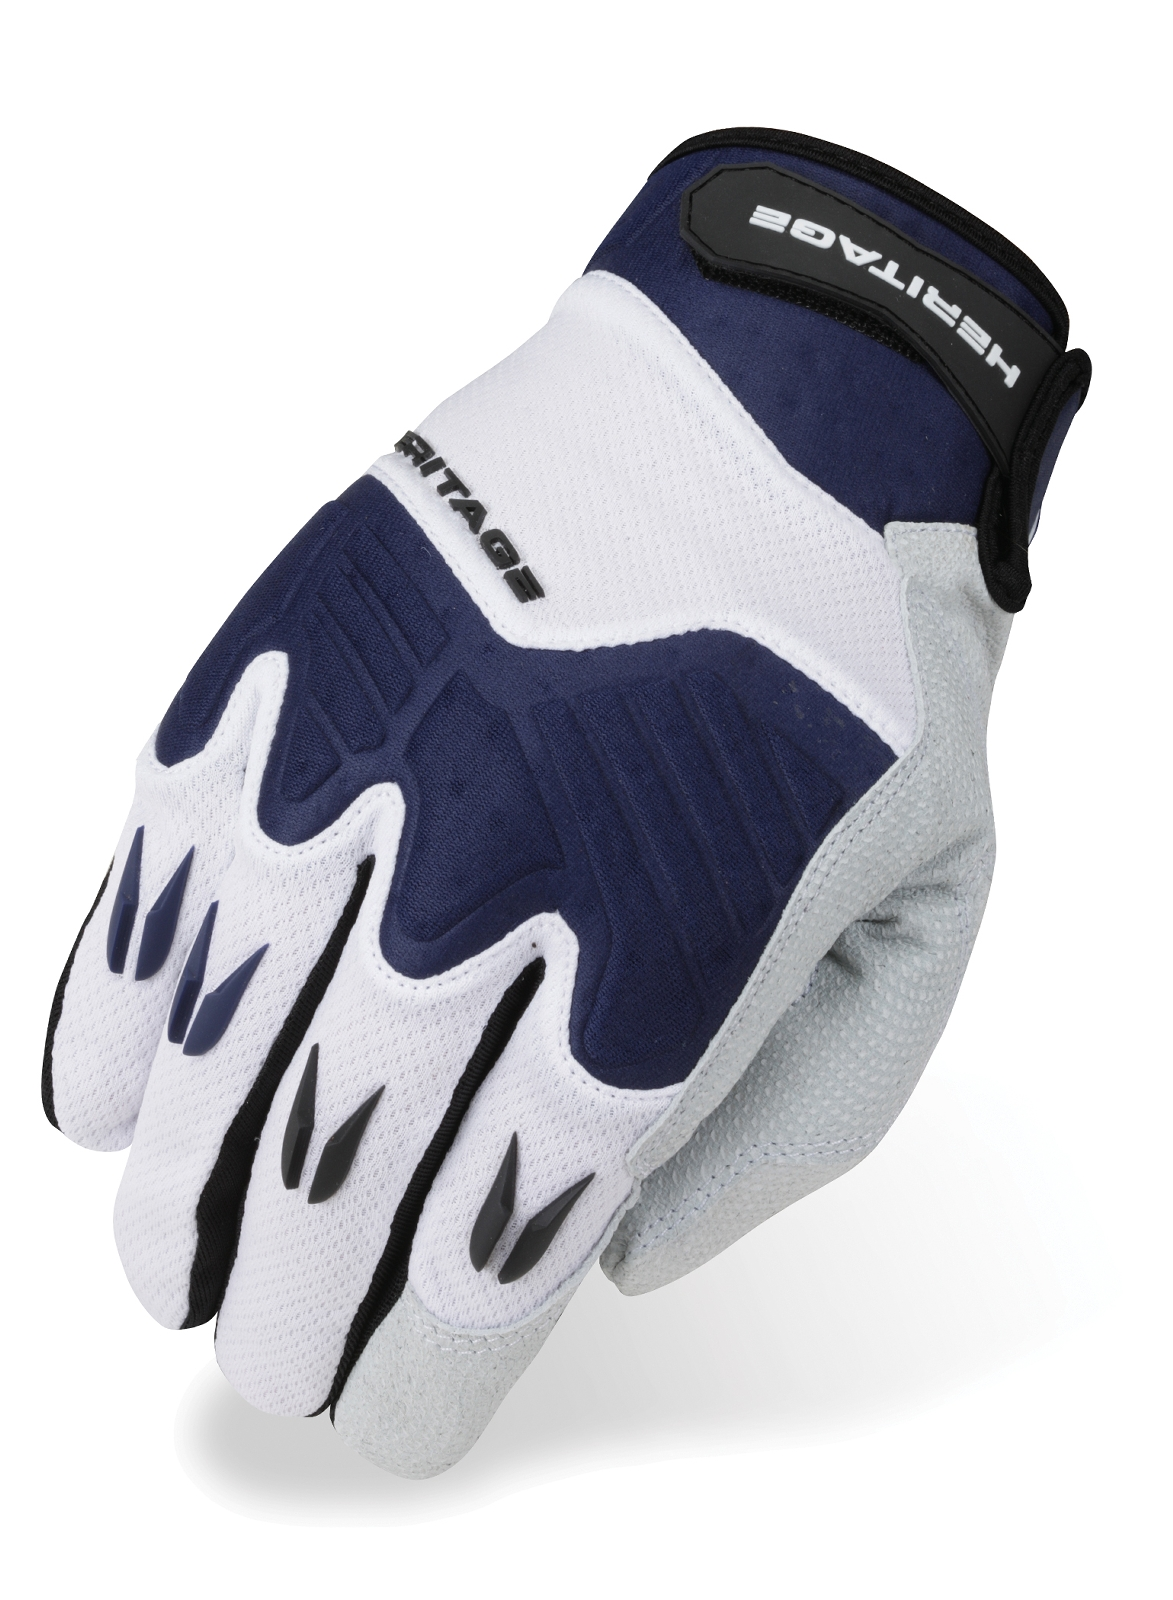 Heritage Pro Polo Glove